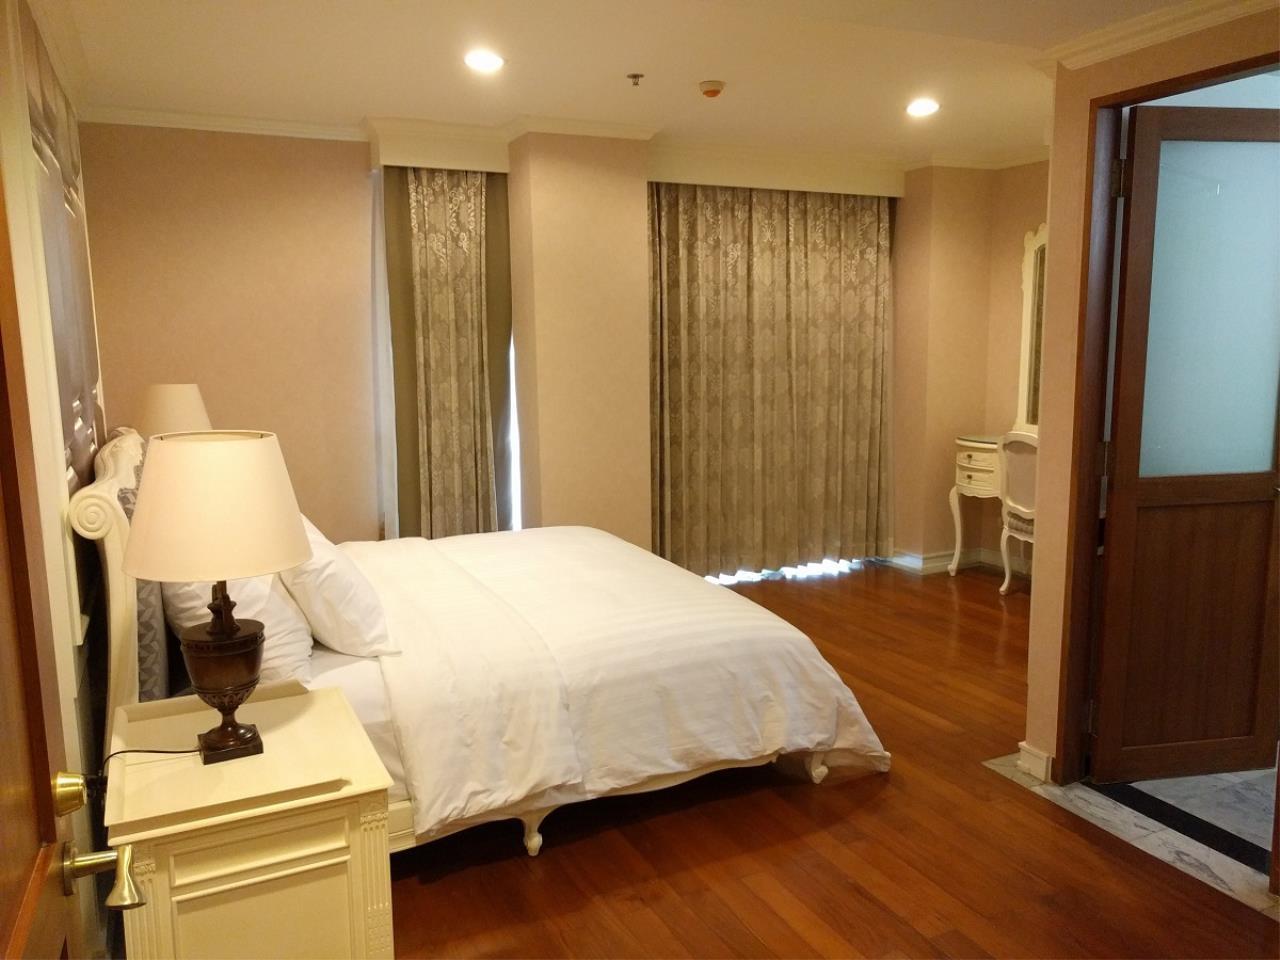 RE/MAX CondoDee Agency's Thai Elegance Luxury Condominium - Entire Building for Sale 15